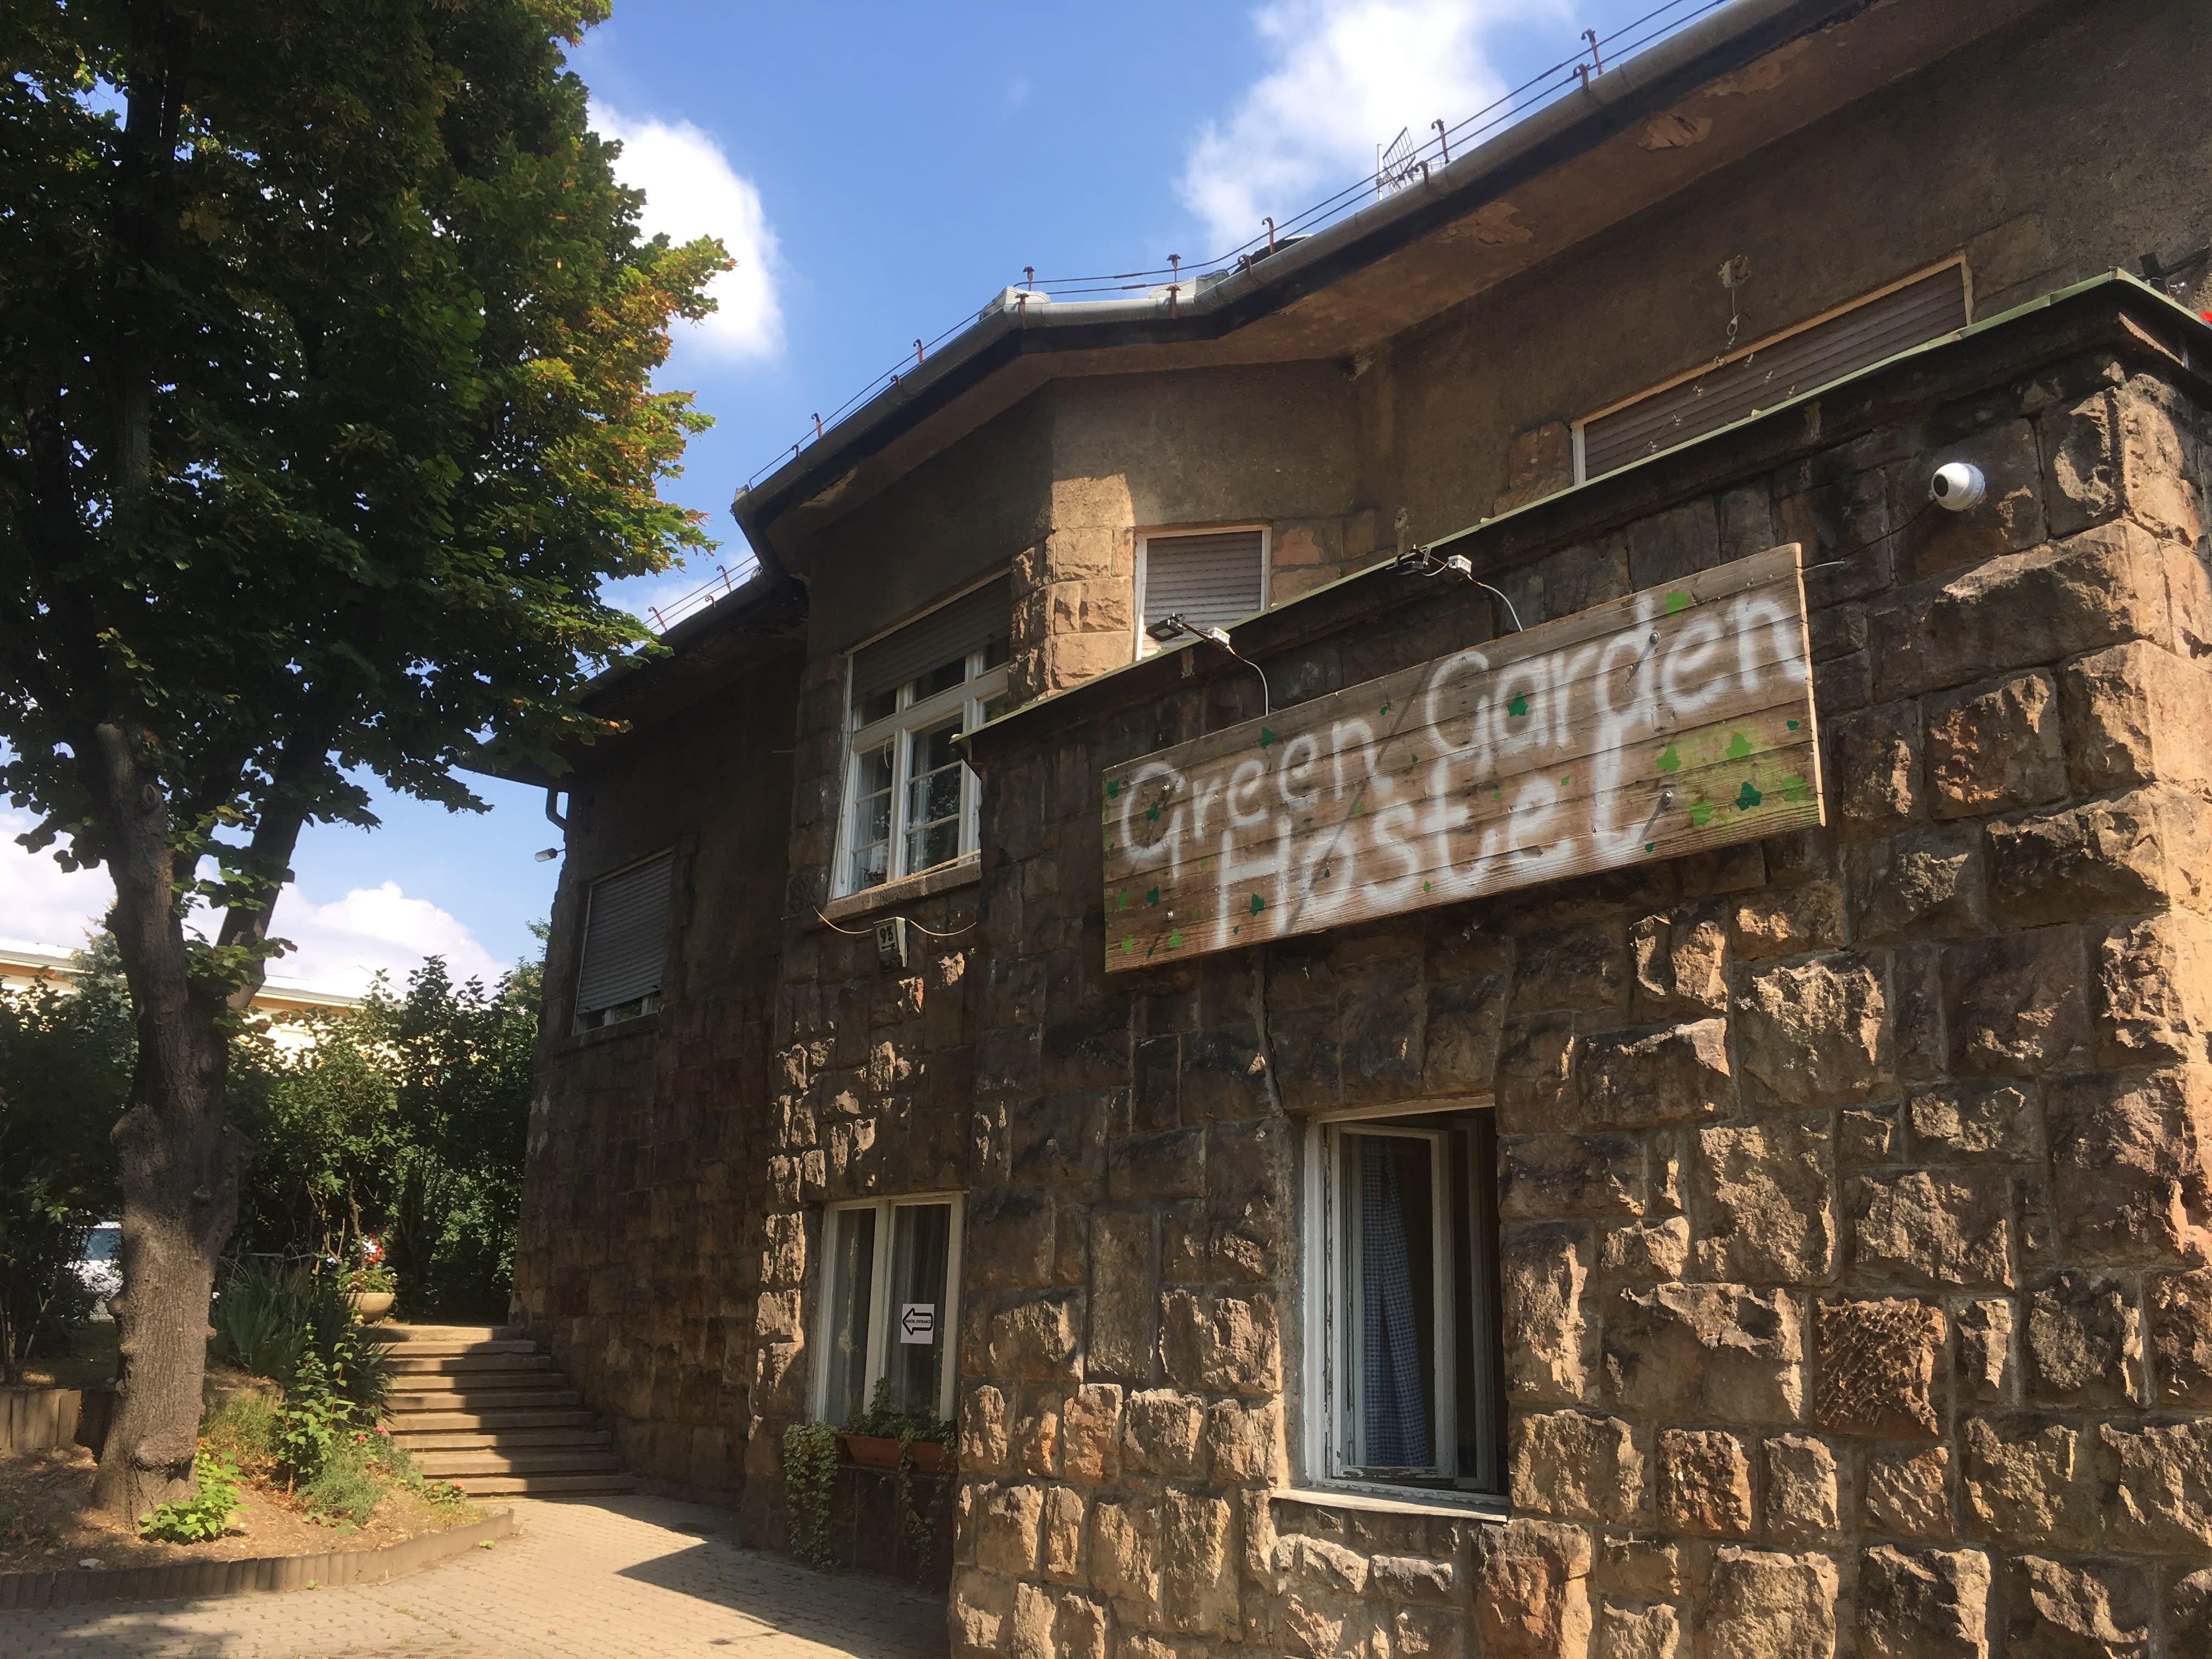 HOSTEL - Green Garden Hostel